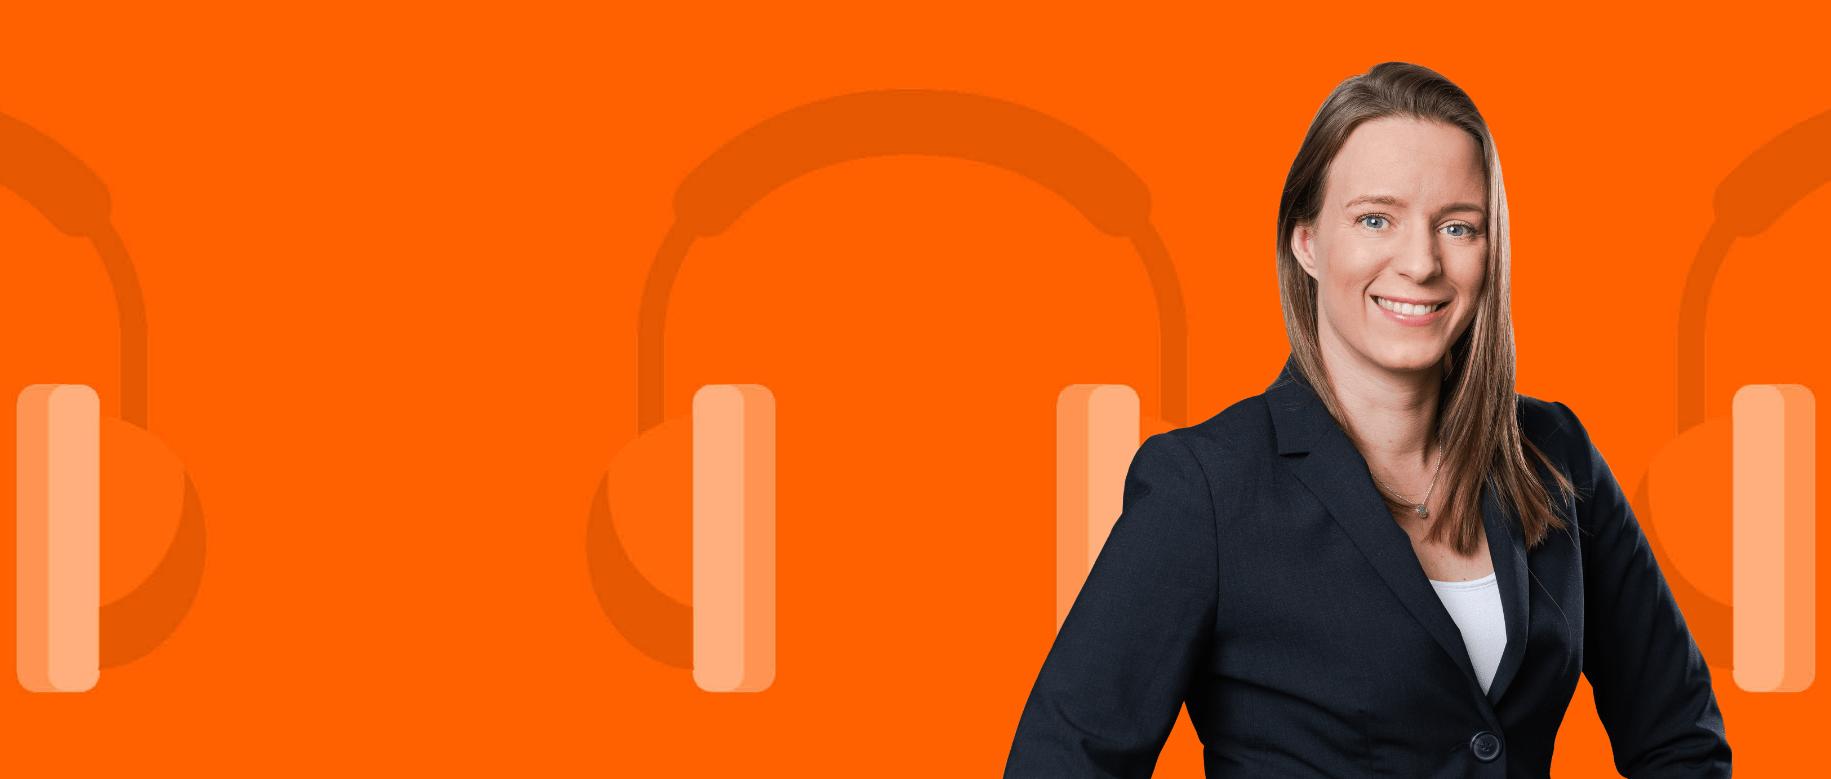 Podcast Afke Schouten